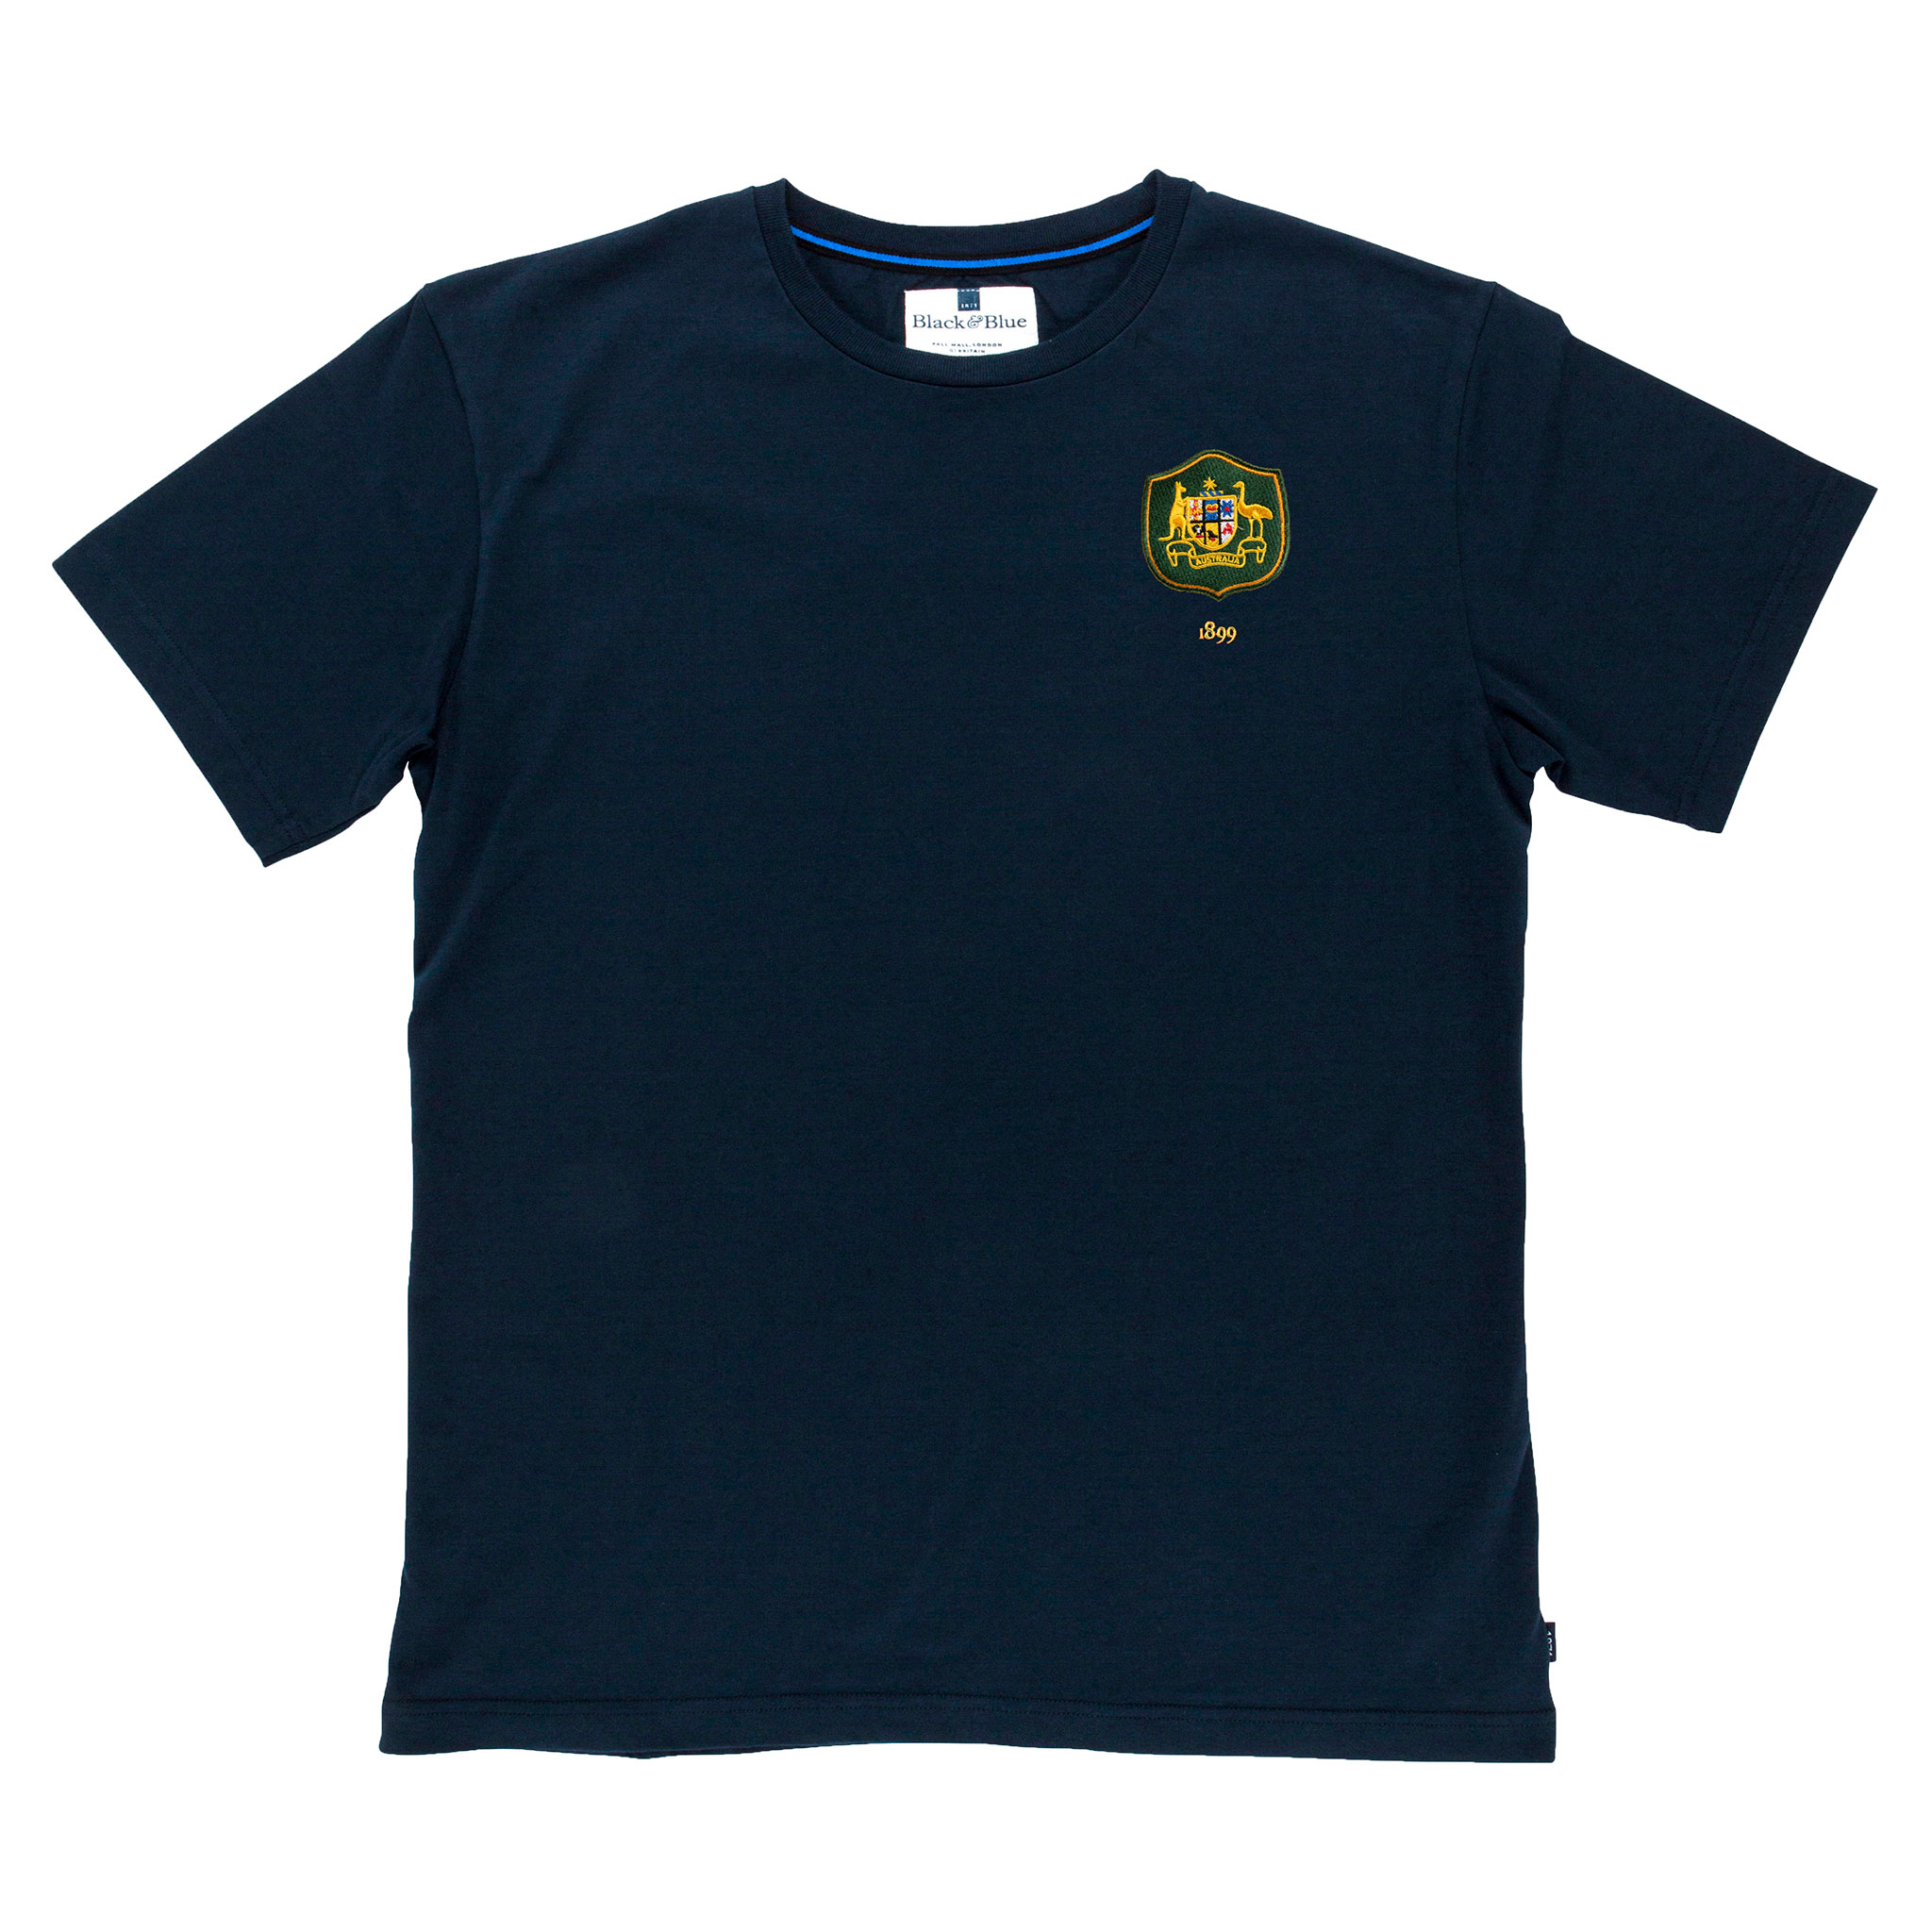 Australia 1899 Navy T-Shirt_Front